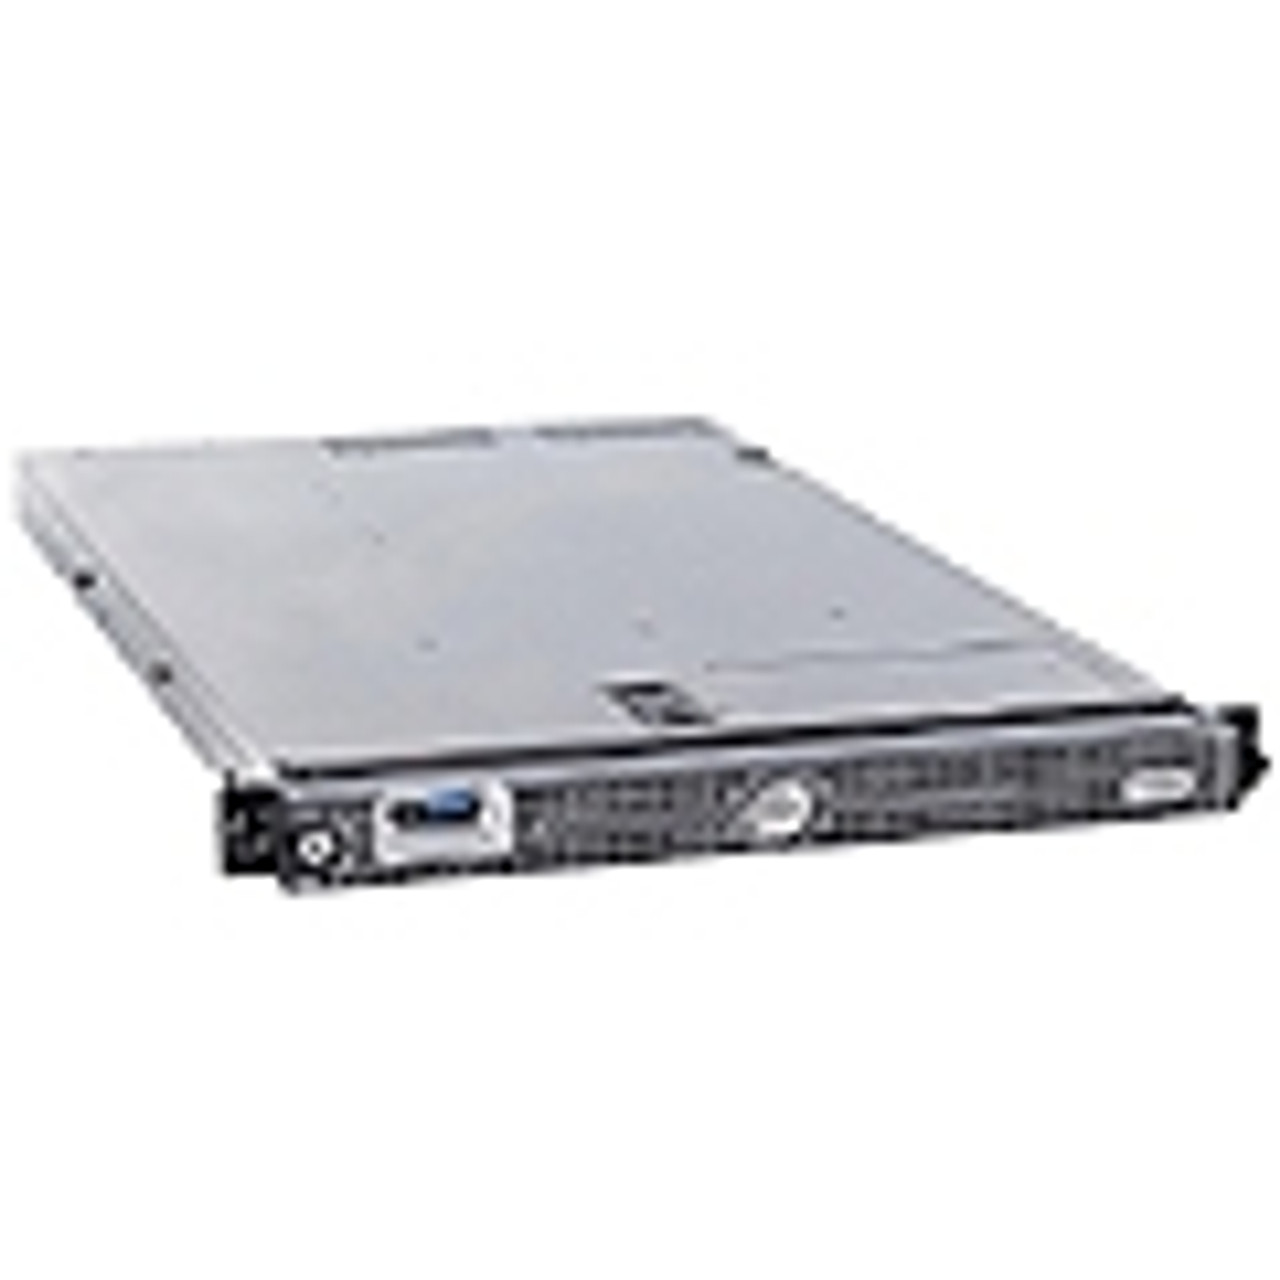 Dell PowerEdge 1950 Servers